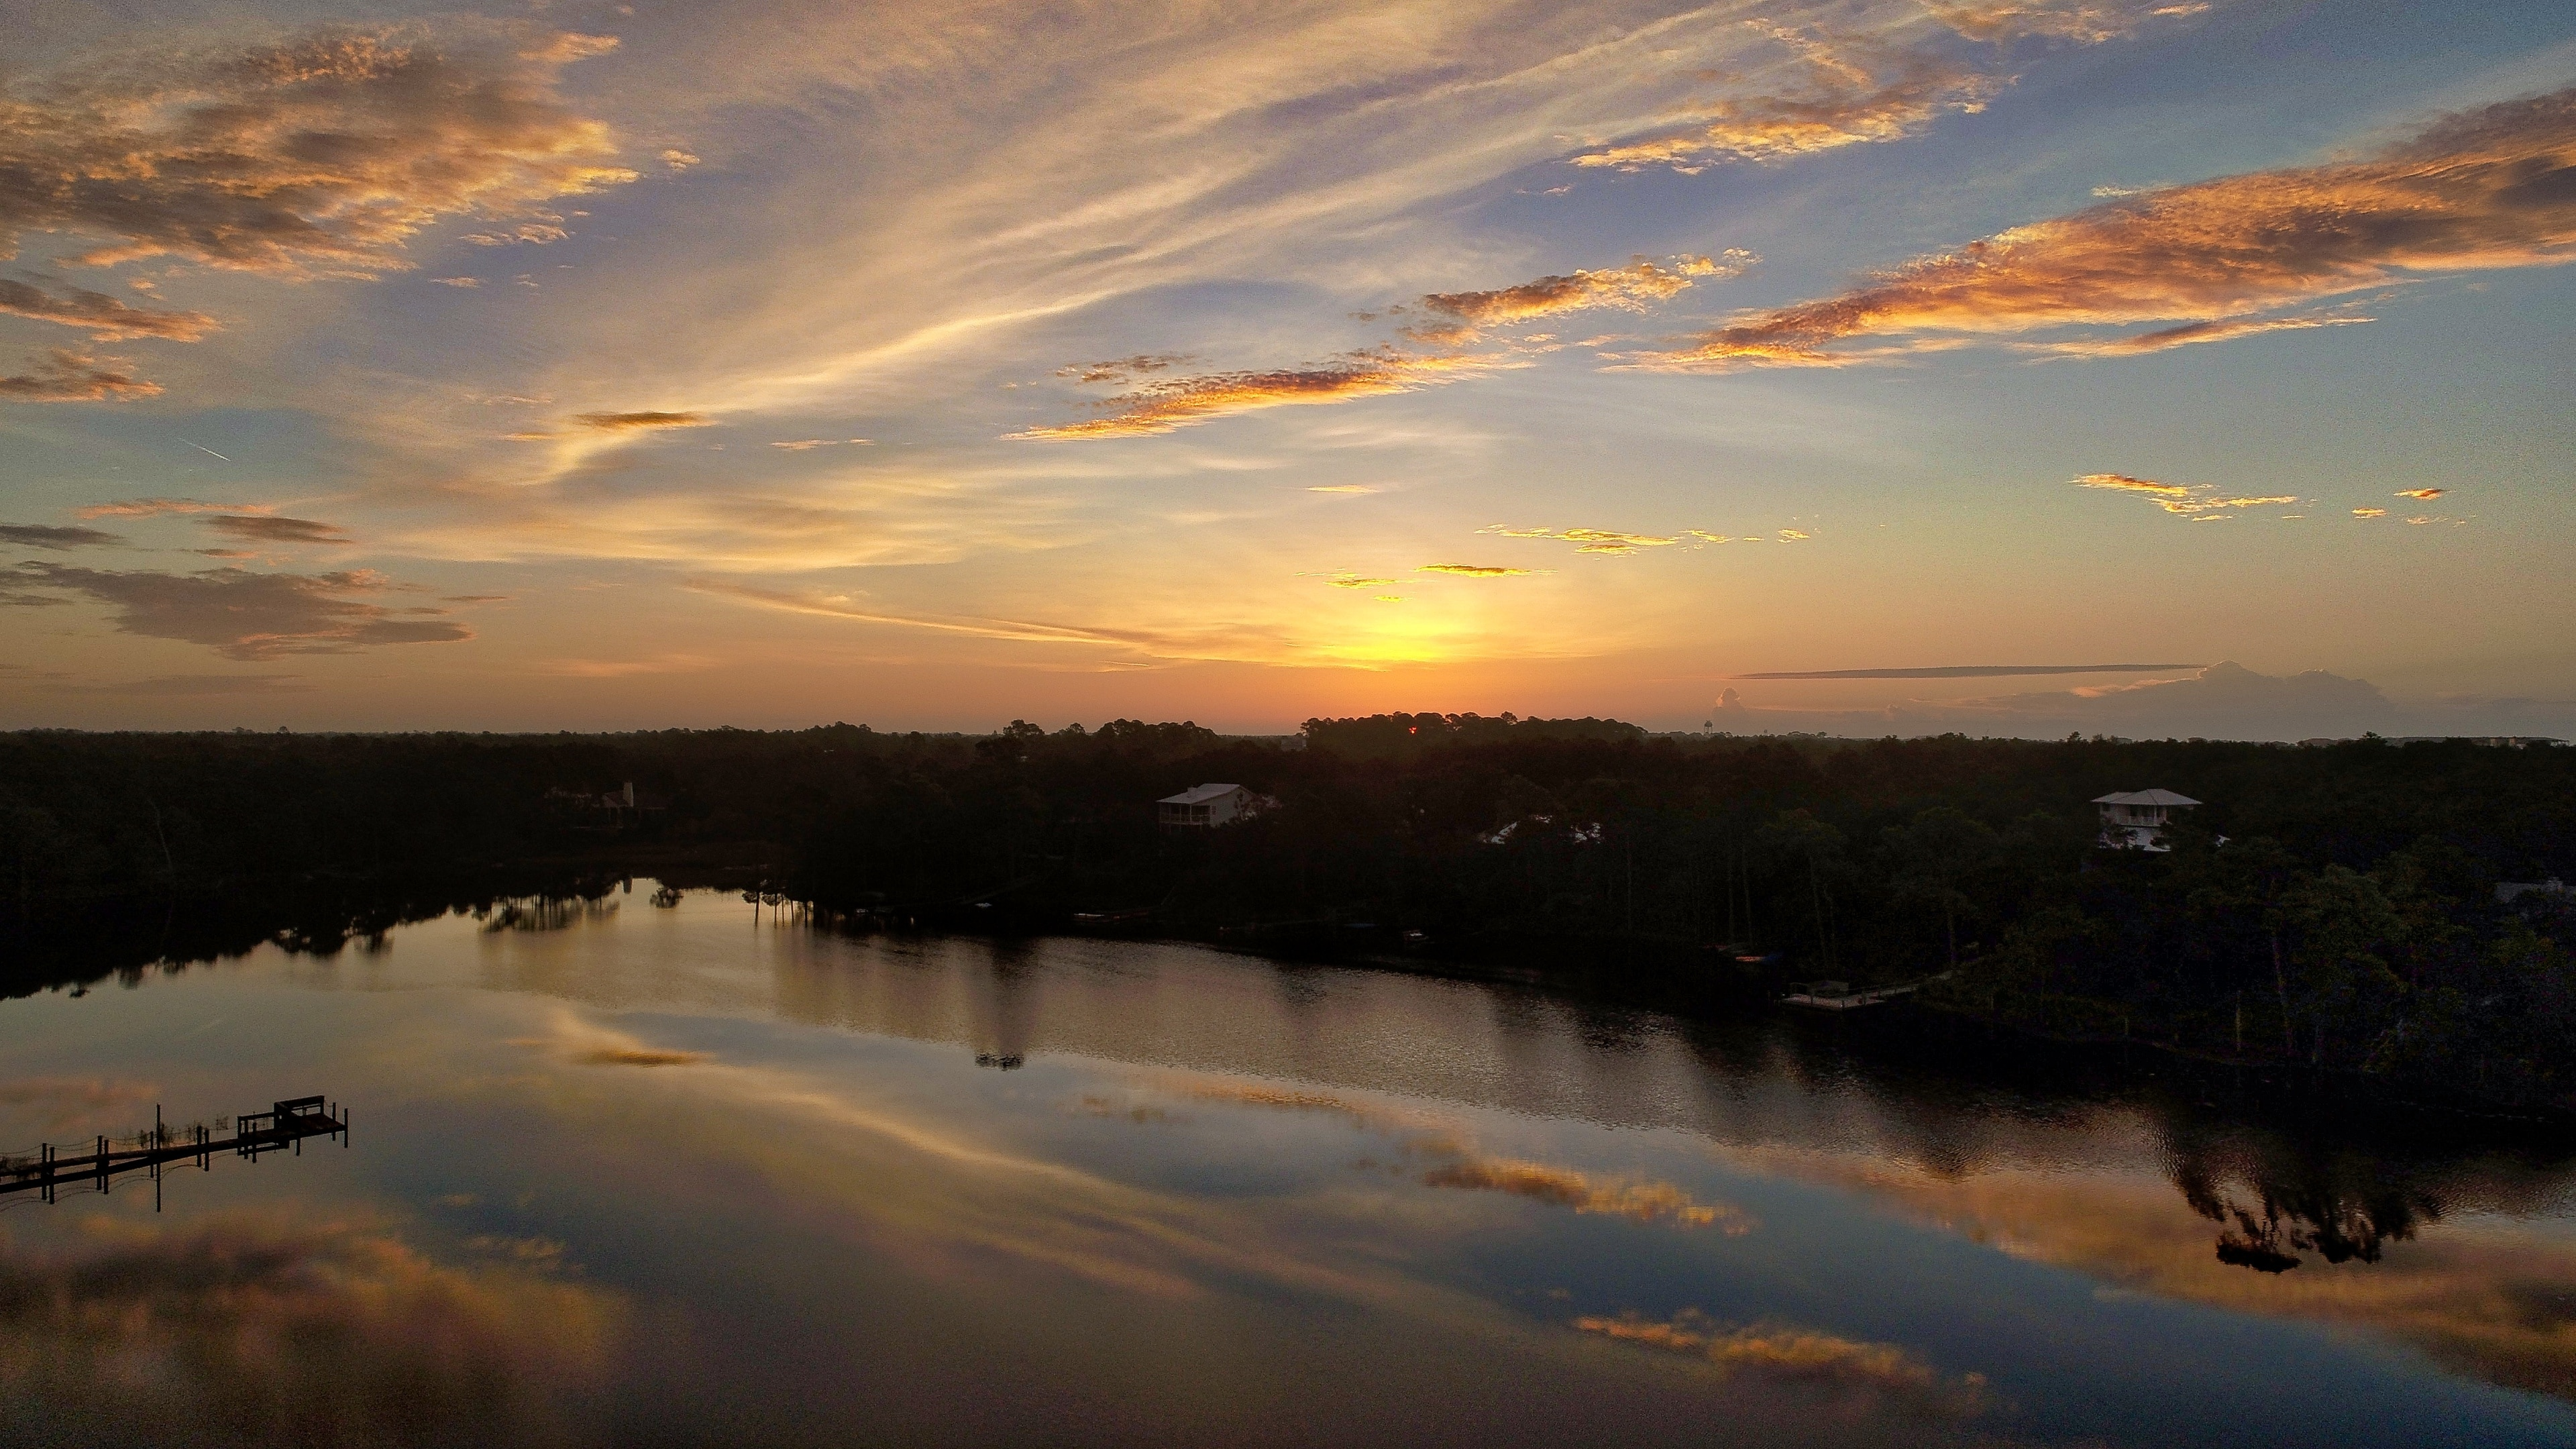 Seacrest, Florida, United States of America